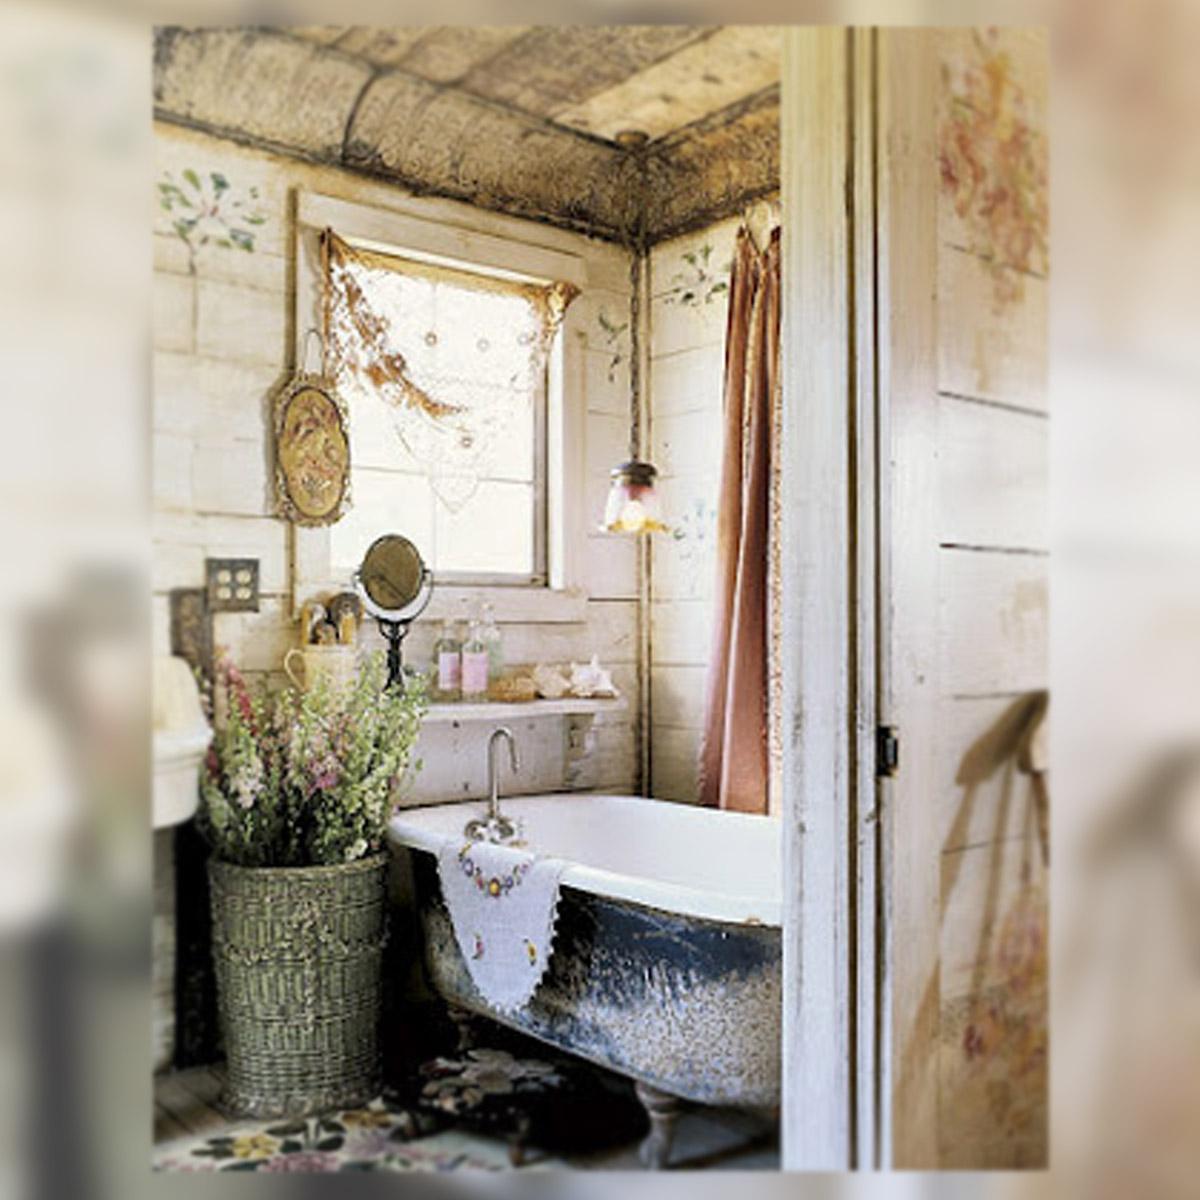 Almacen vintage ba os shabby bathrooms shabby chic - Banos shabby chic ...